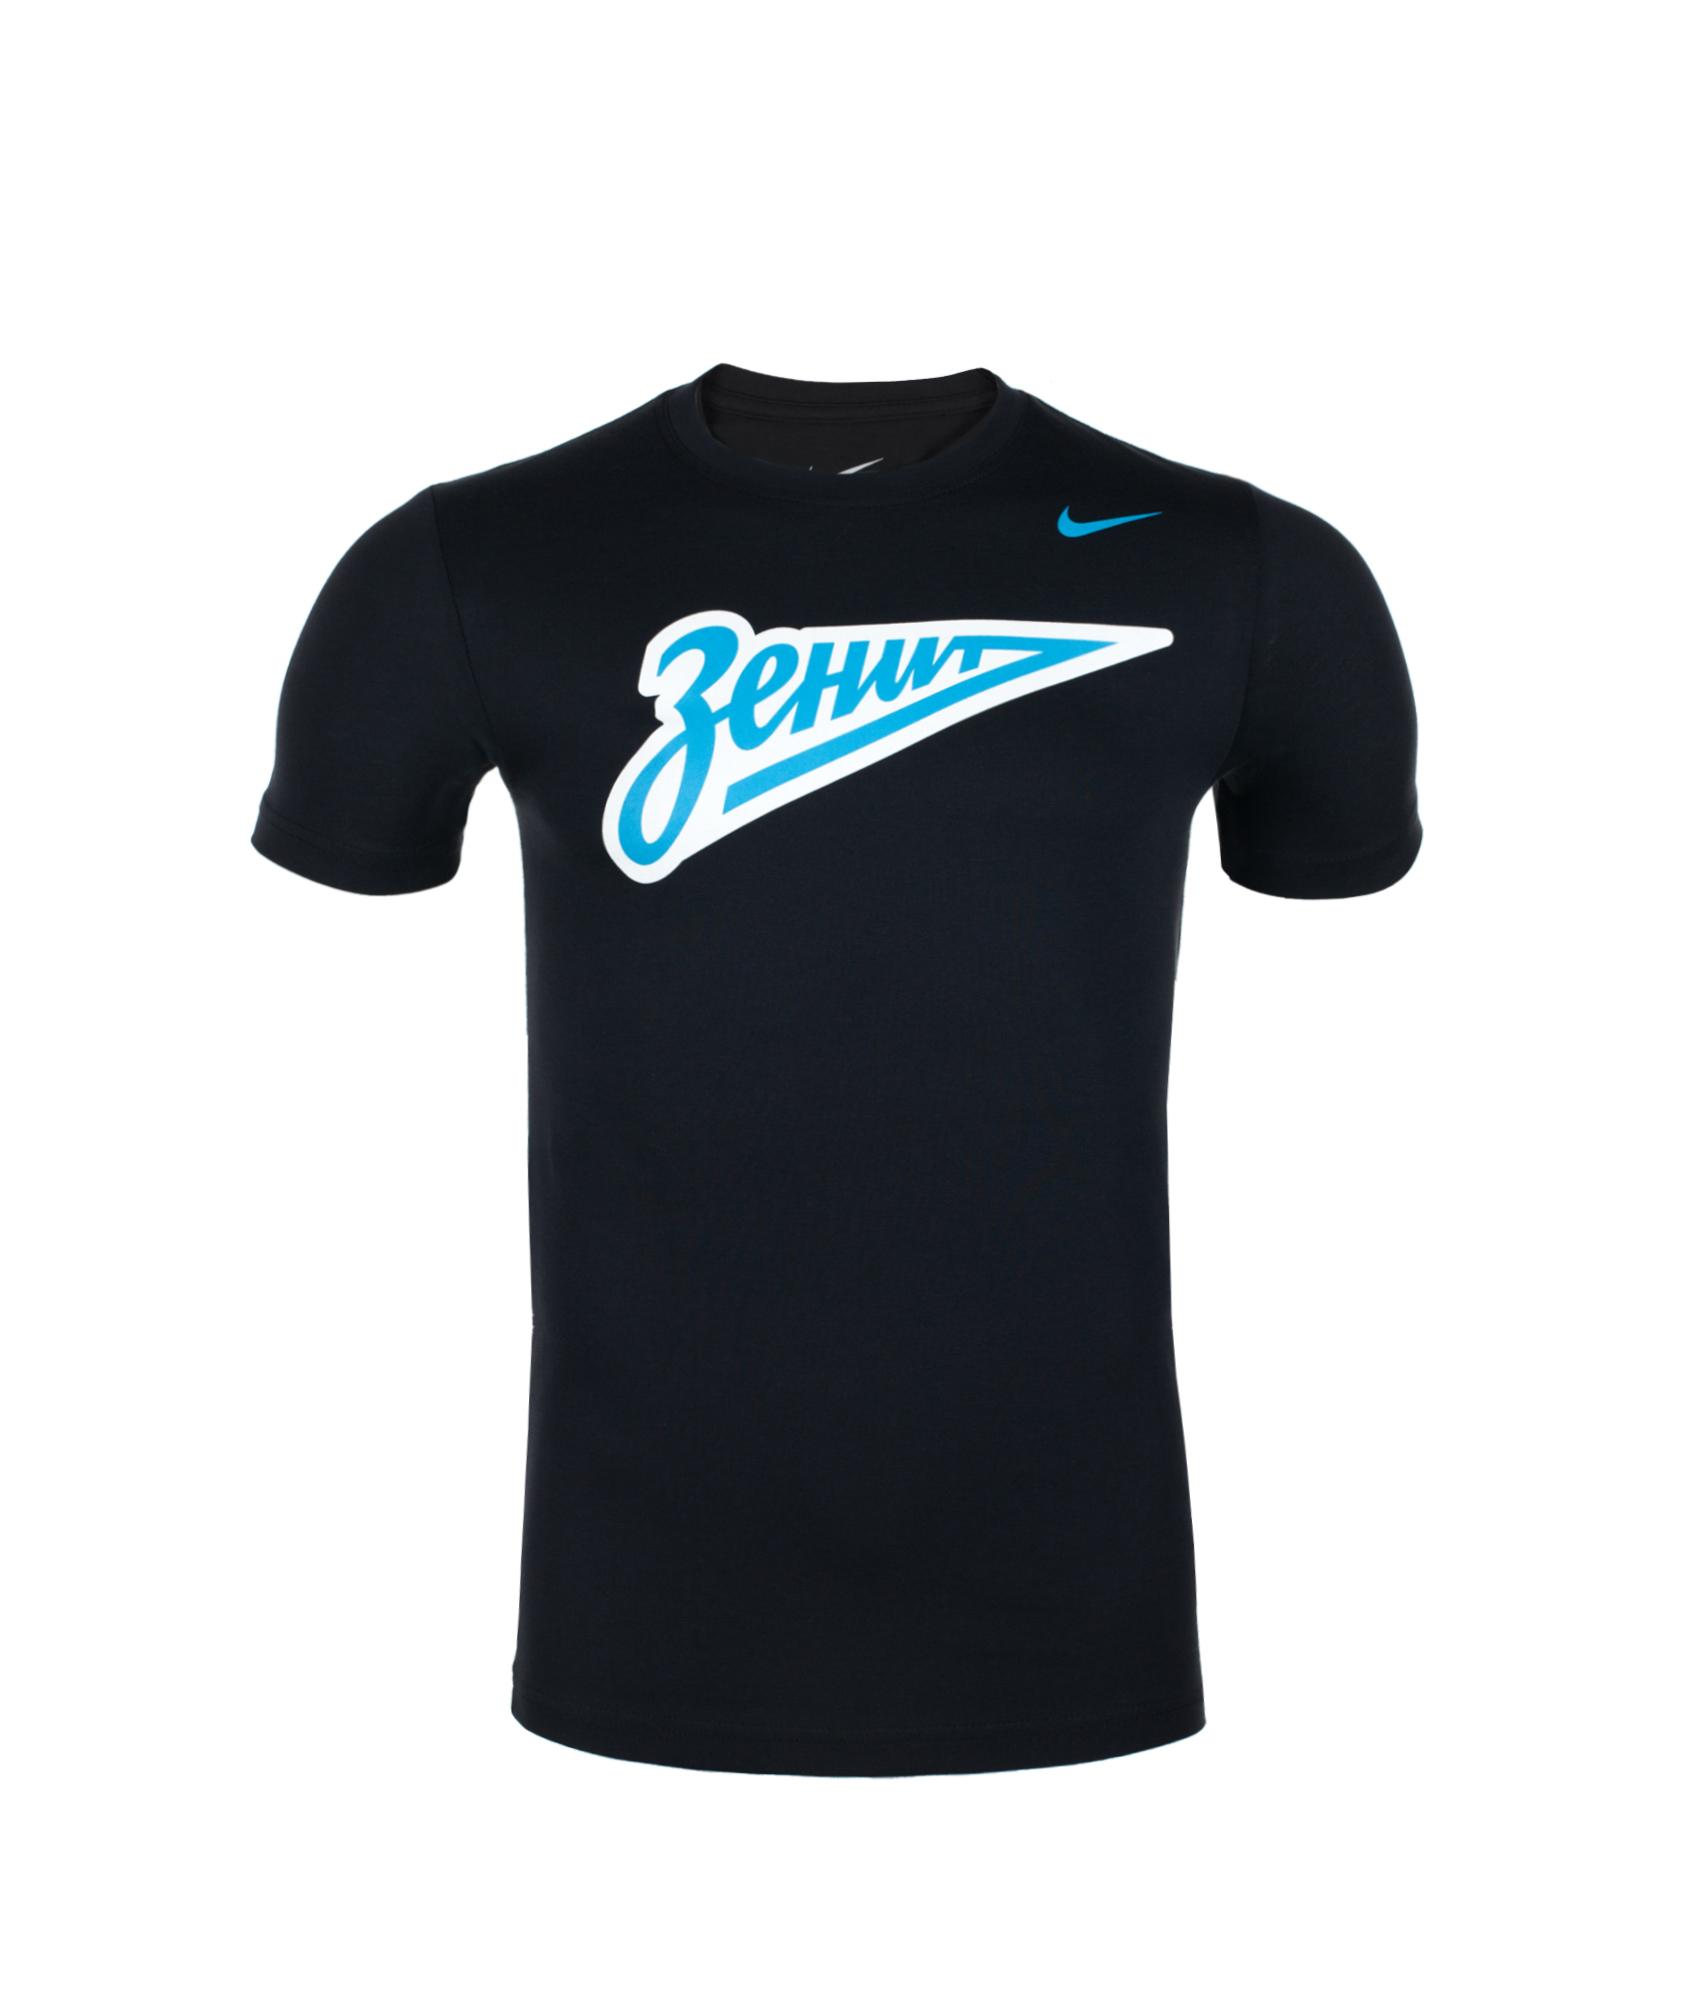 Футболка Nike ZENIT CORE BASIC CREST TEE, Цвет-Черный, Размер-XXL